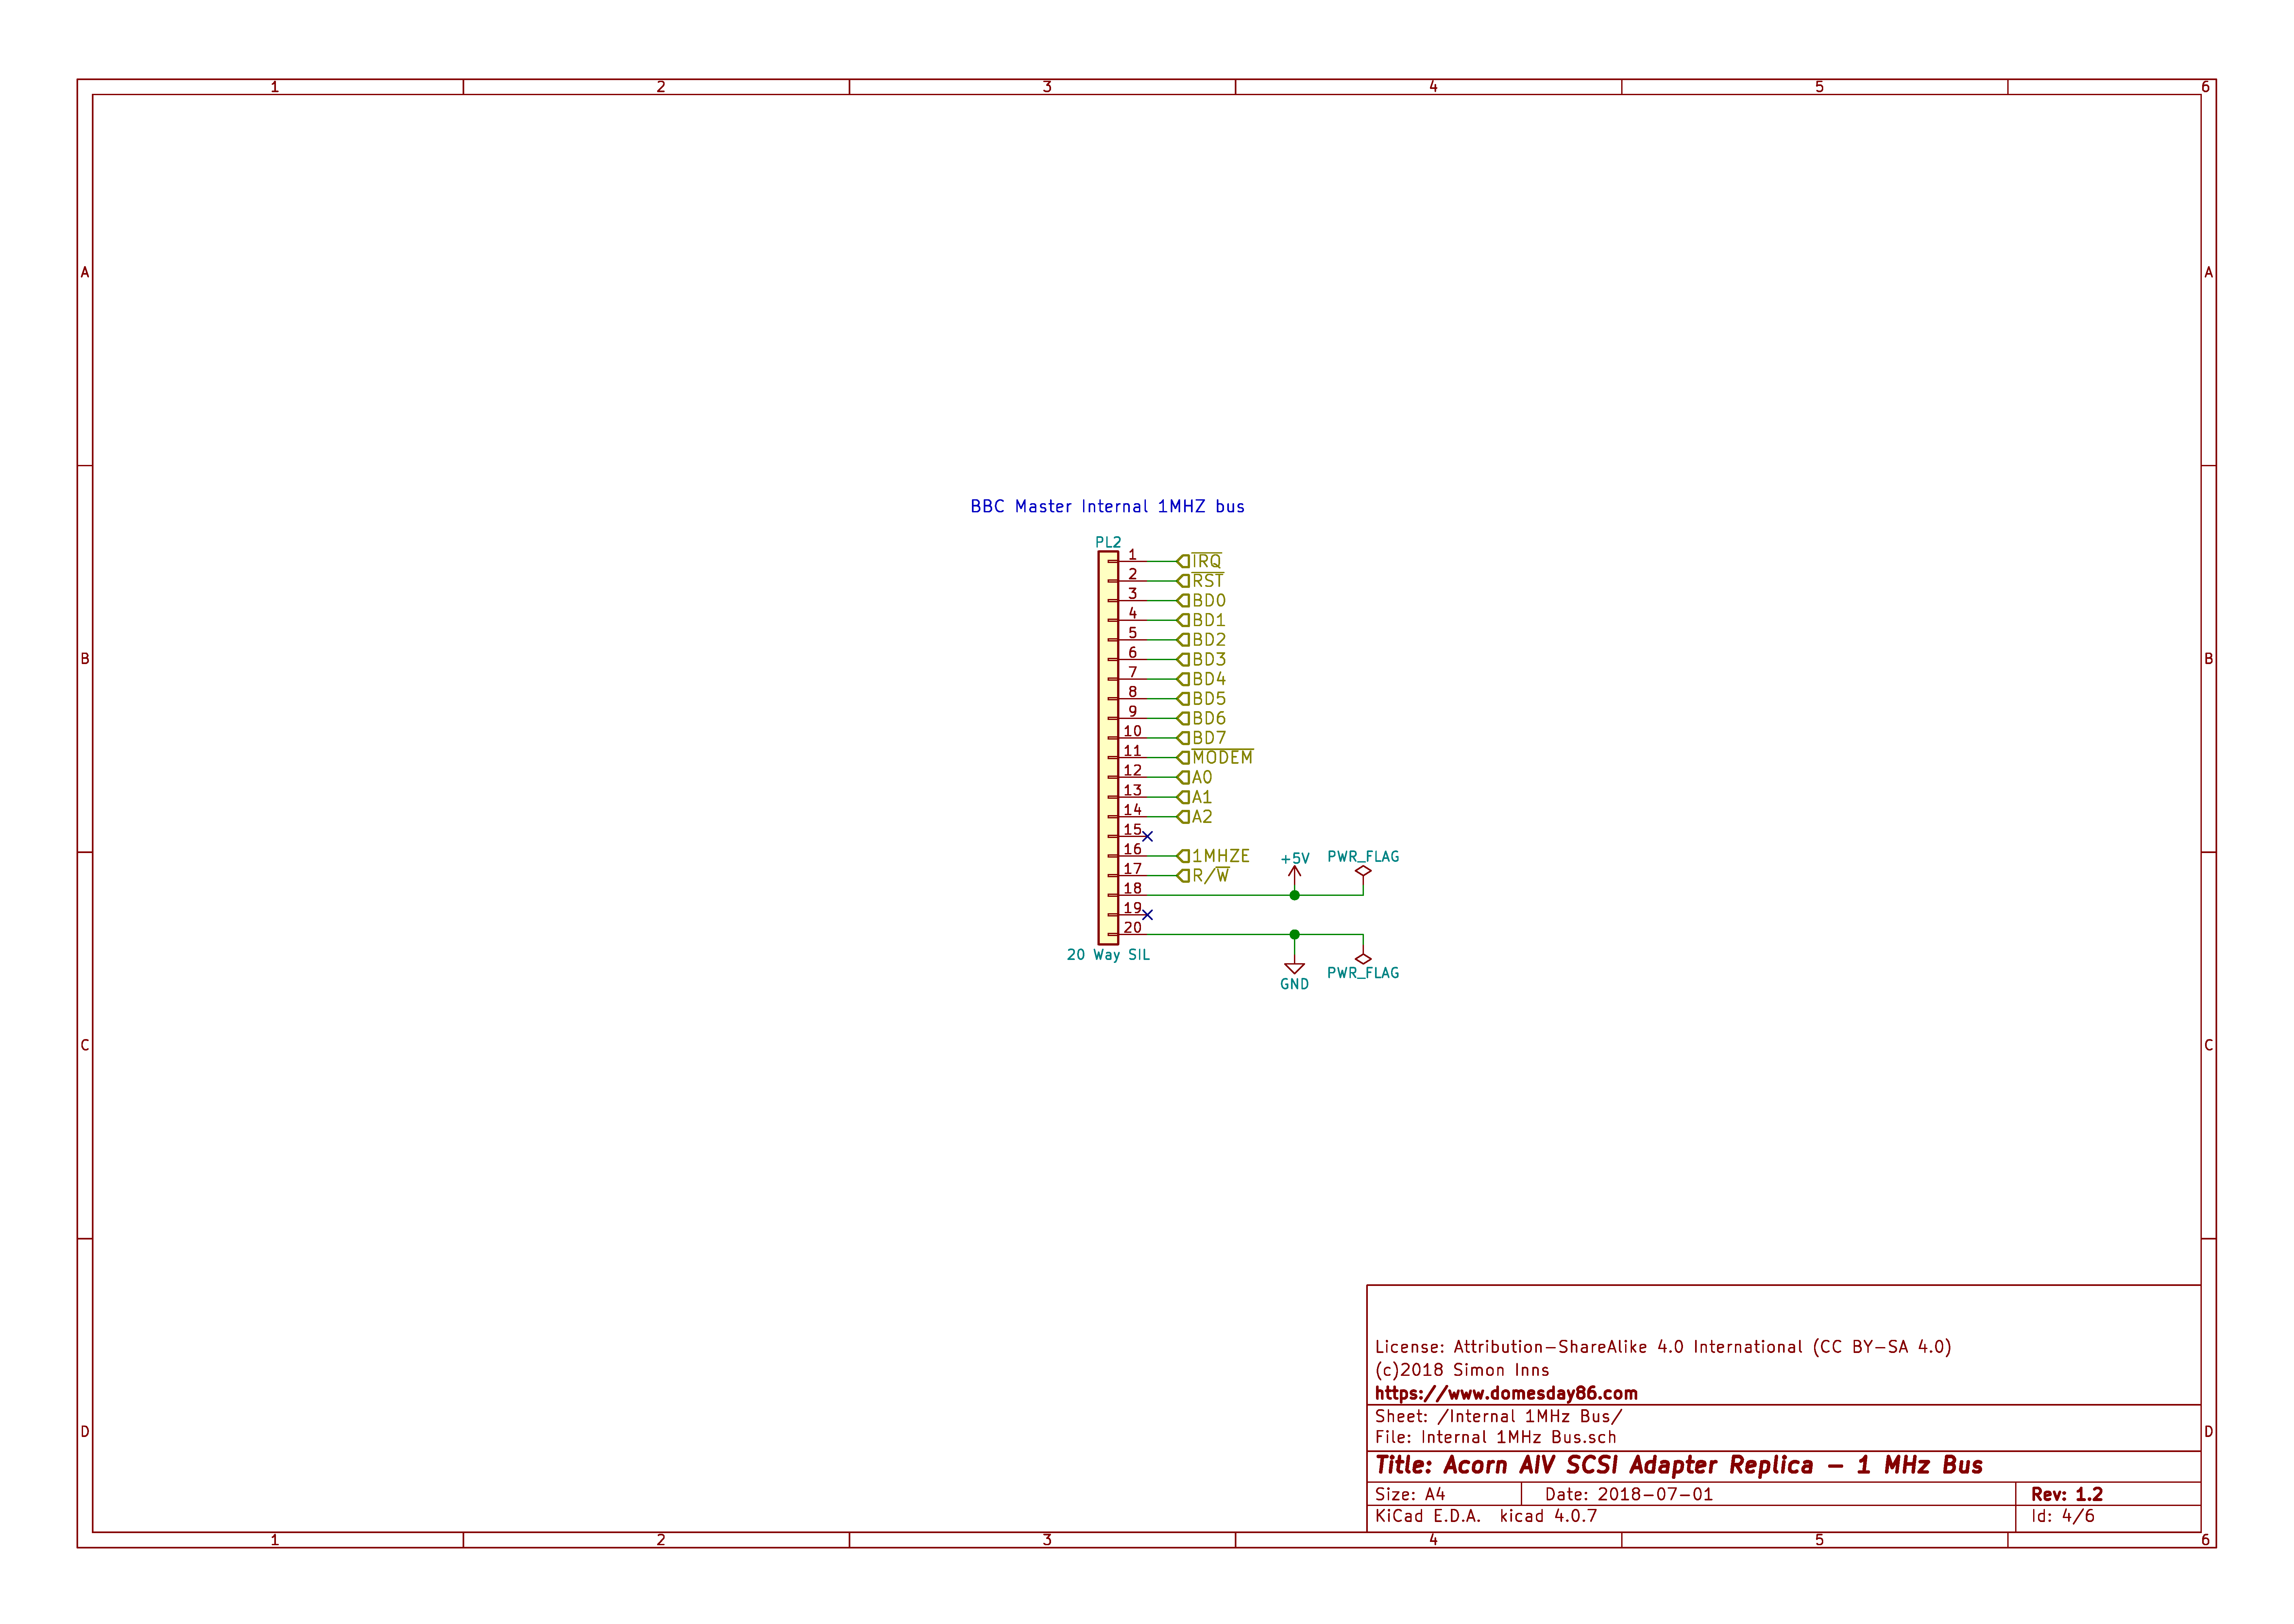 Acorn Aiv Scsi Host Adapter Replacement Wiring Diagram Internal 1 Mhz Bus